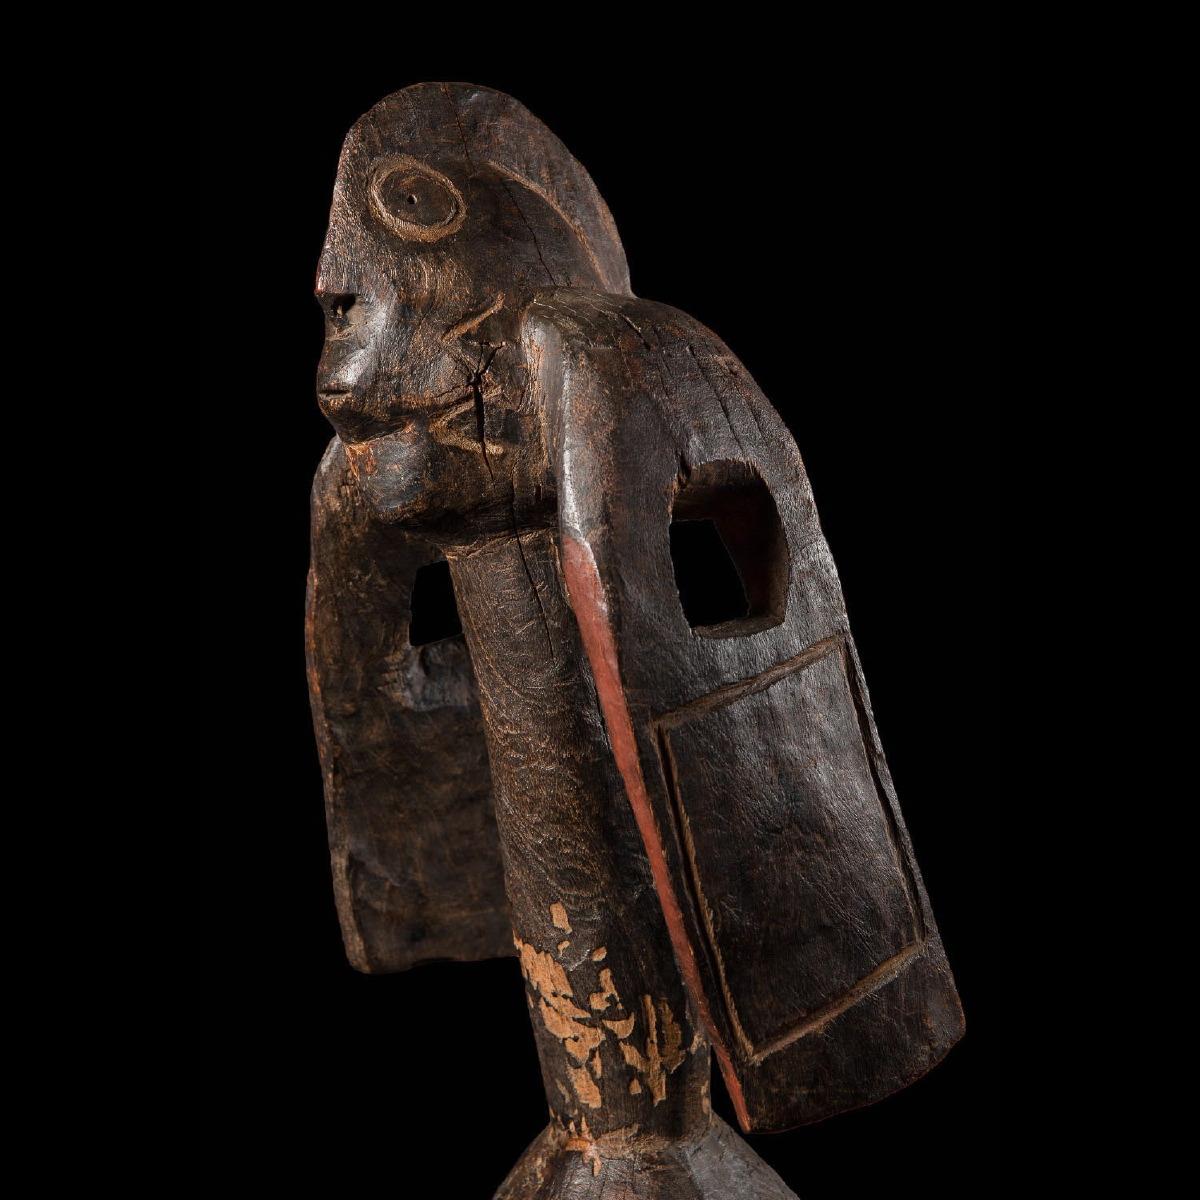 Photo of MUMUYE MASK FROM THE METROPOLITAN MUSEUM